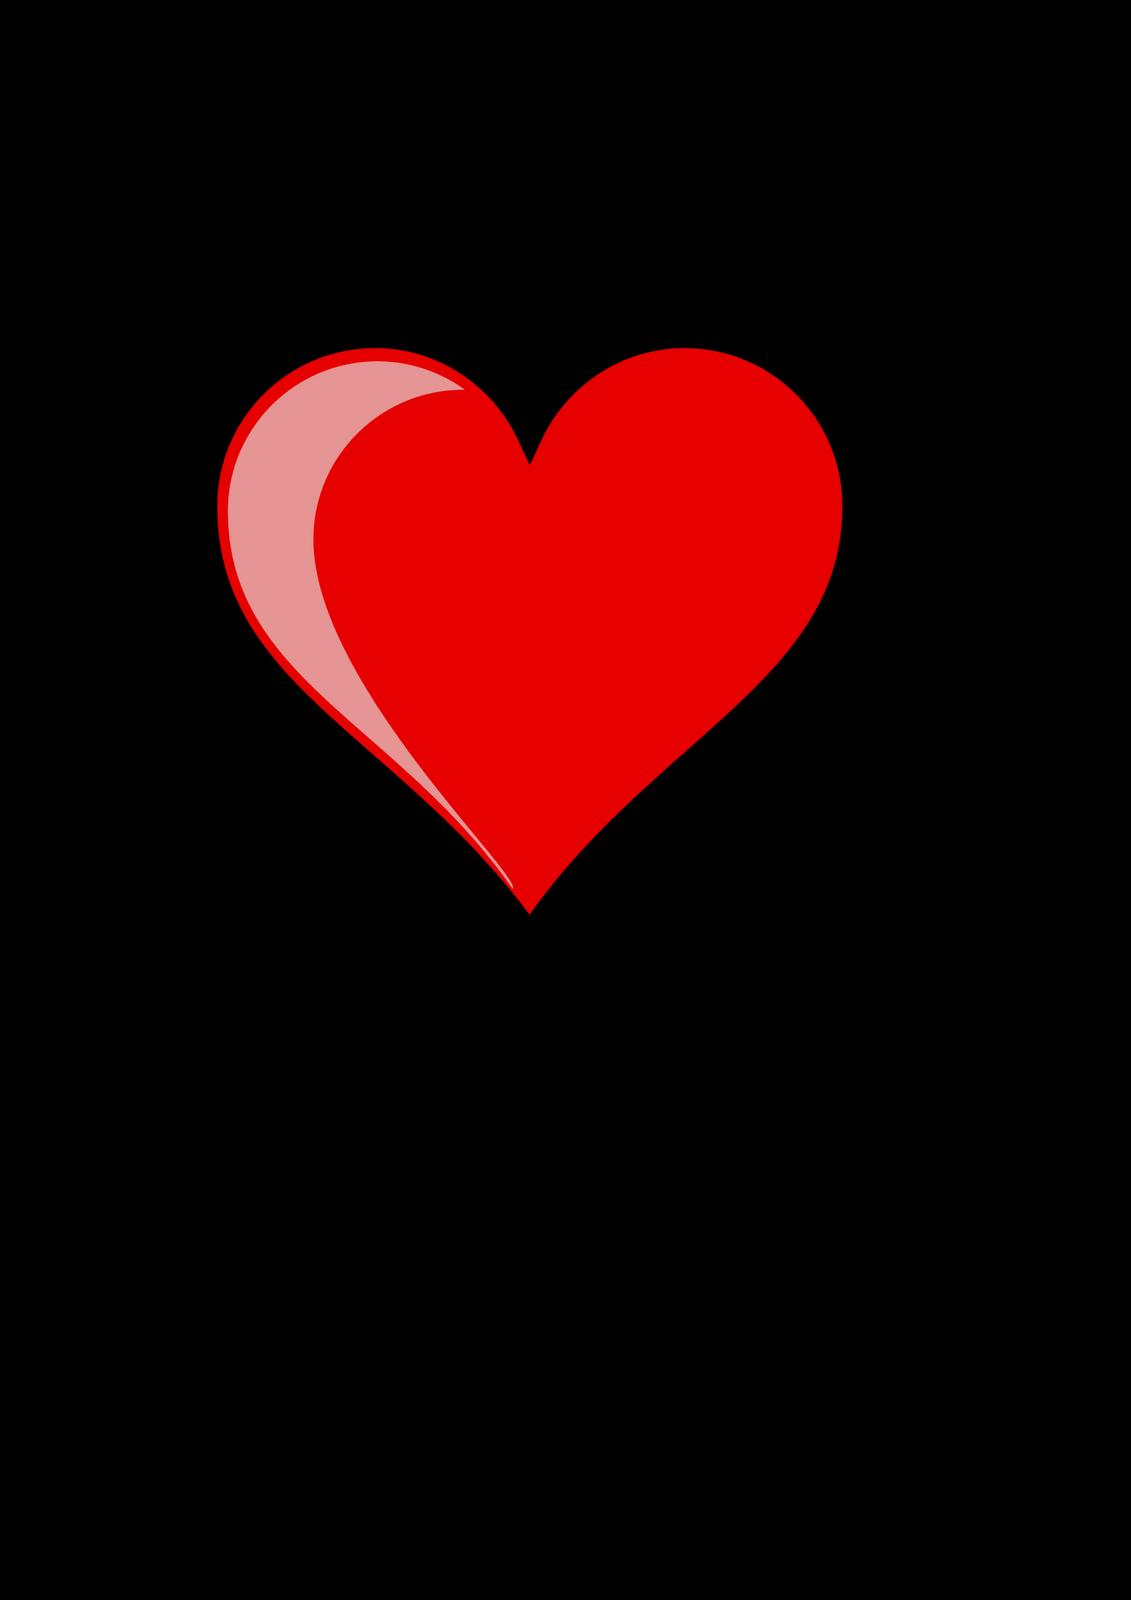 Valentine download best . Free christian valentines day clipart